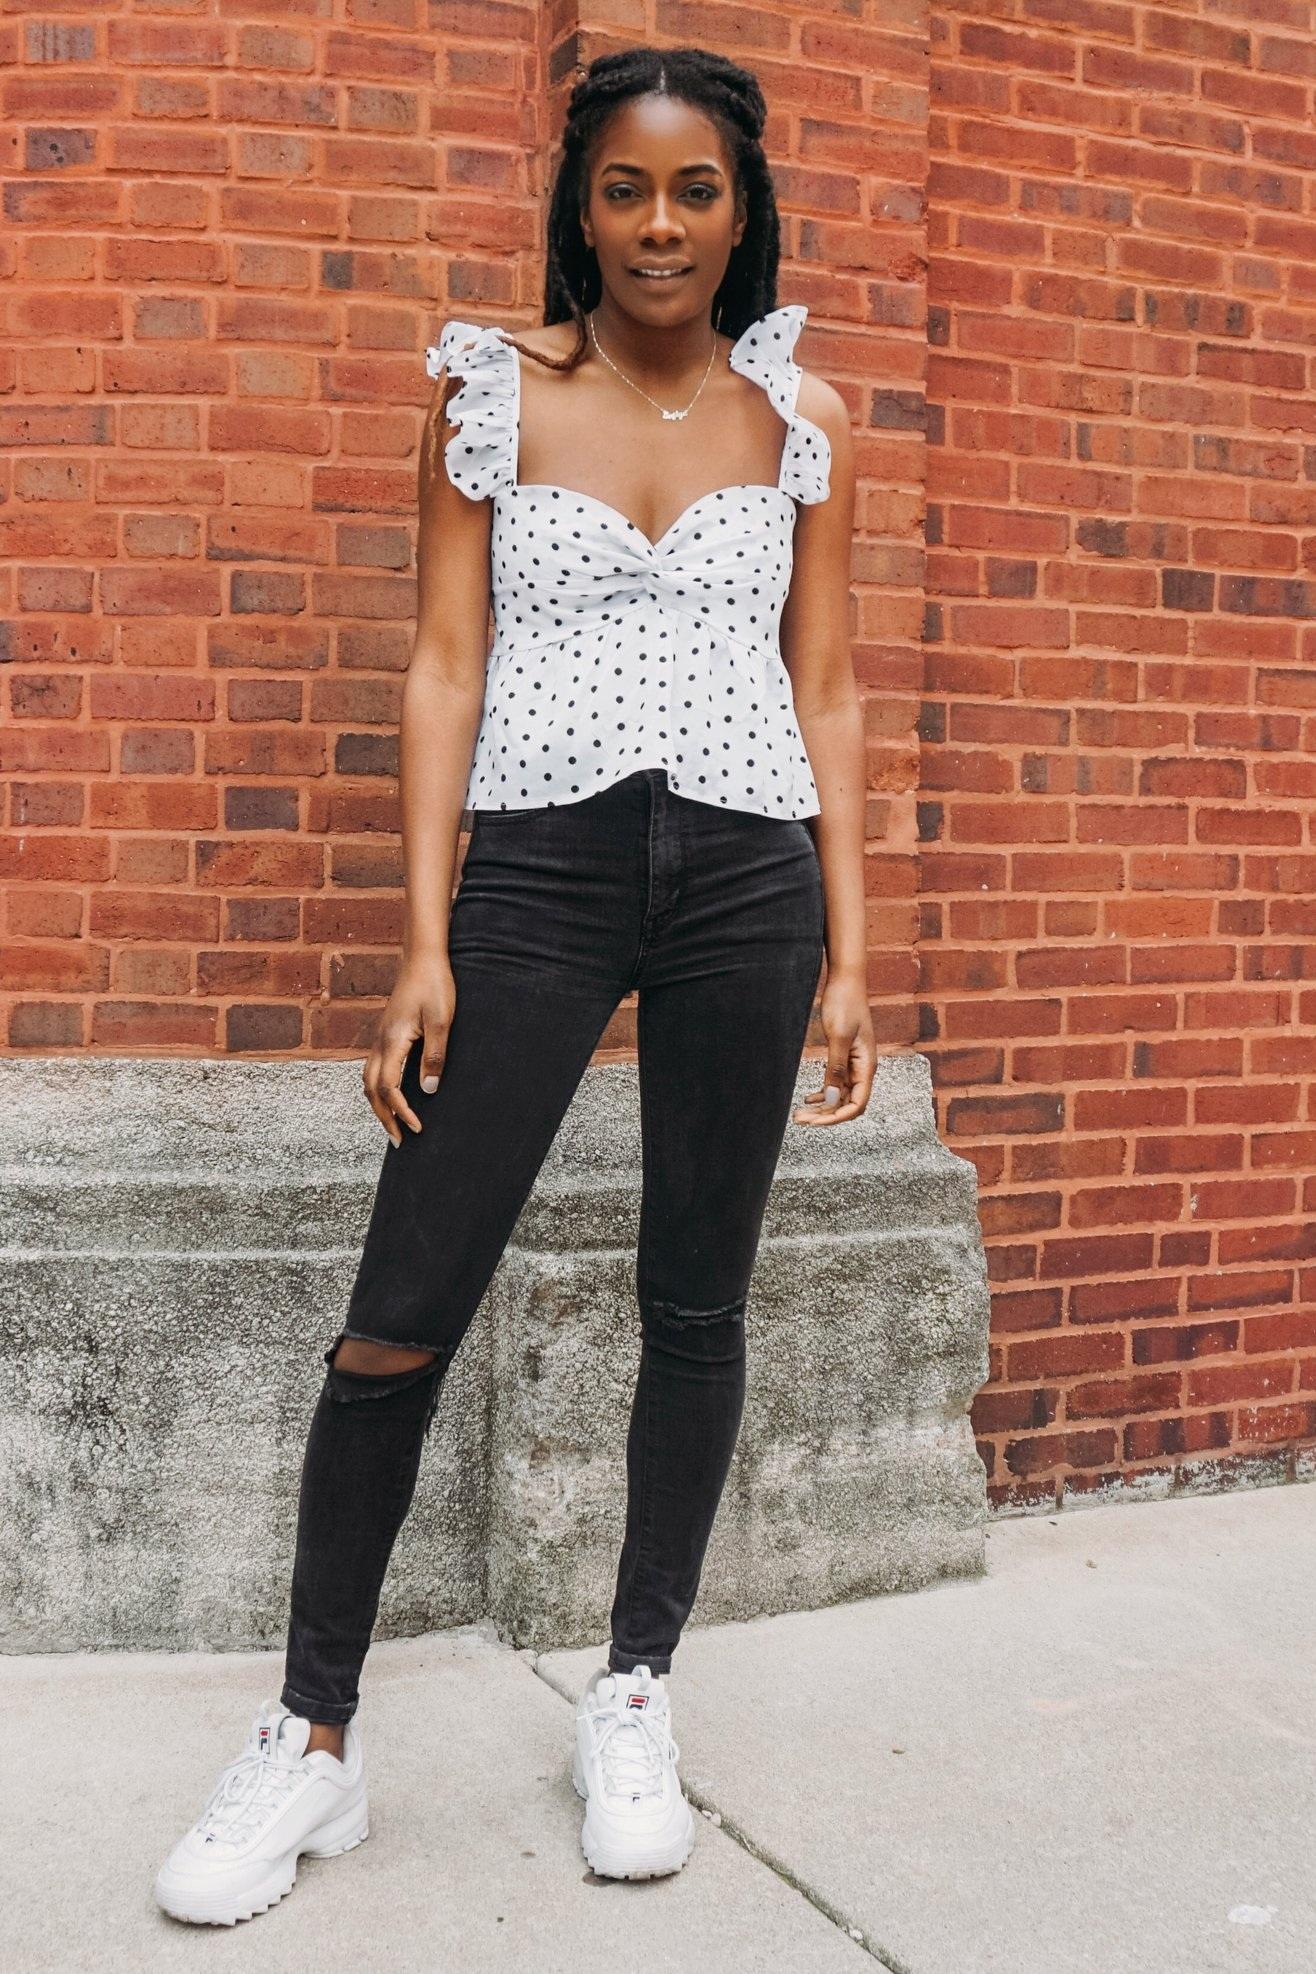 White+polka+dot+ruggle+shoulder+top.jpg